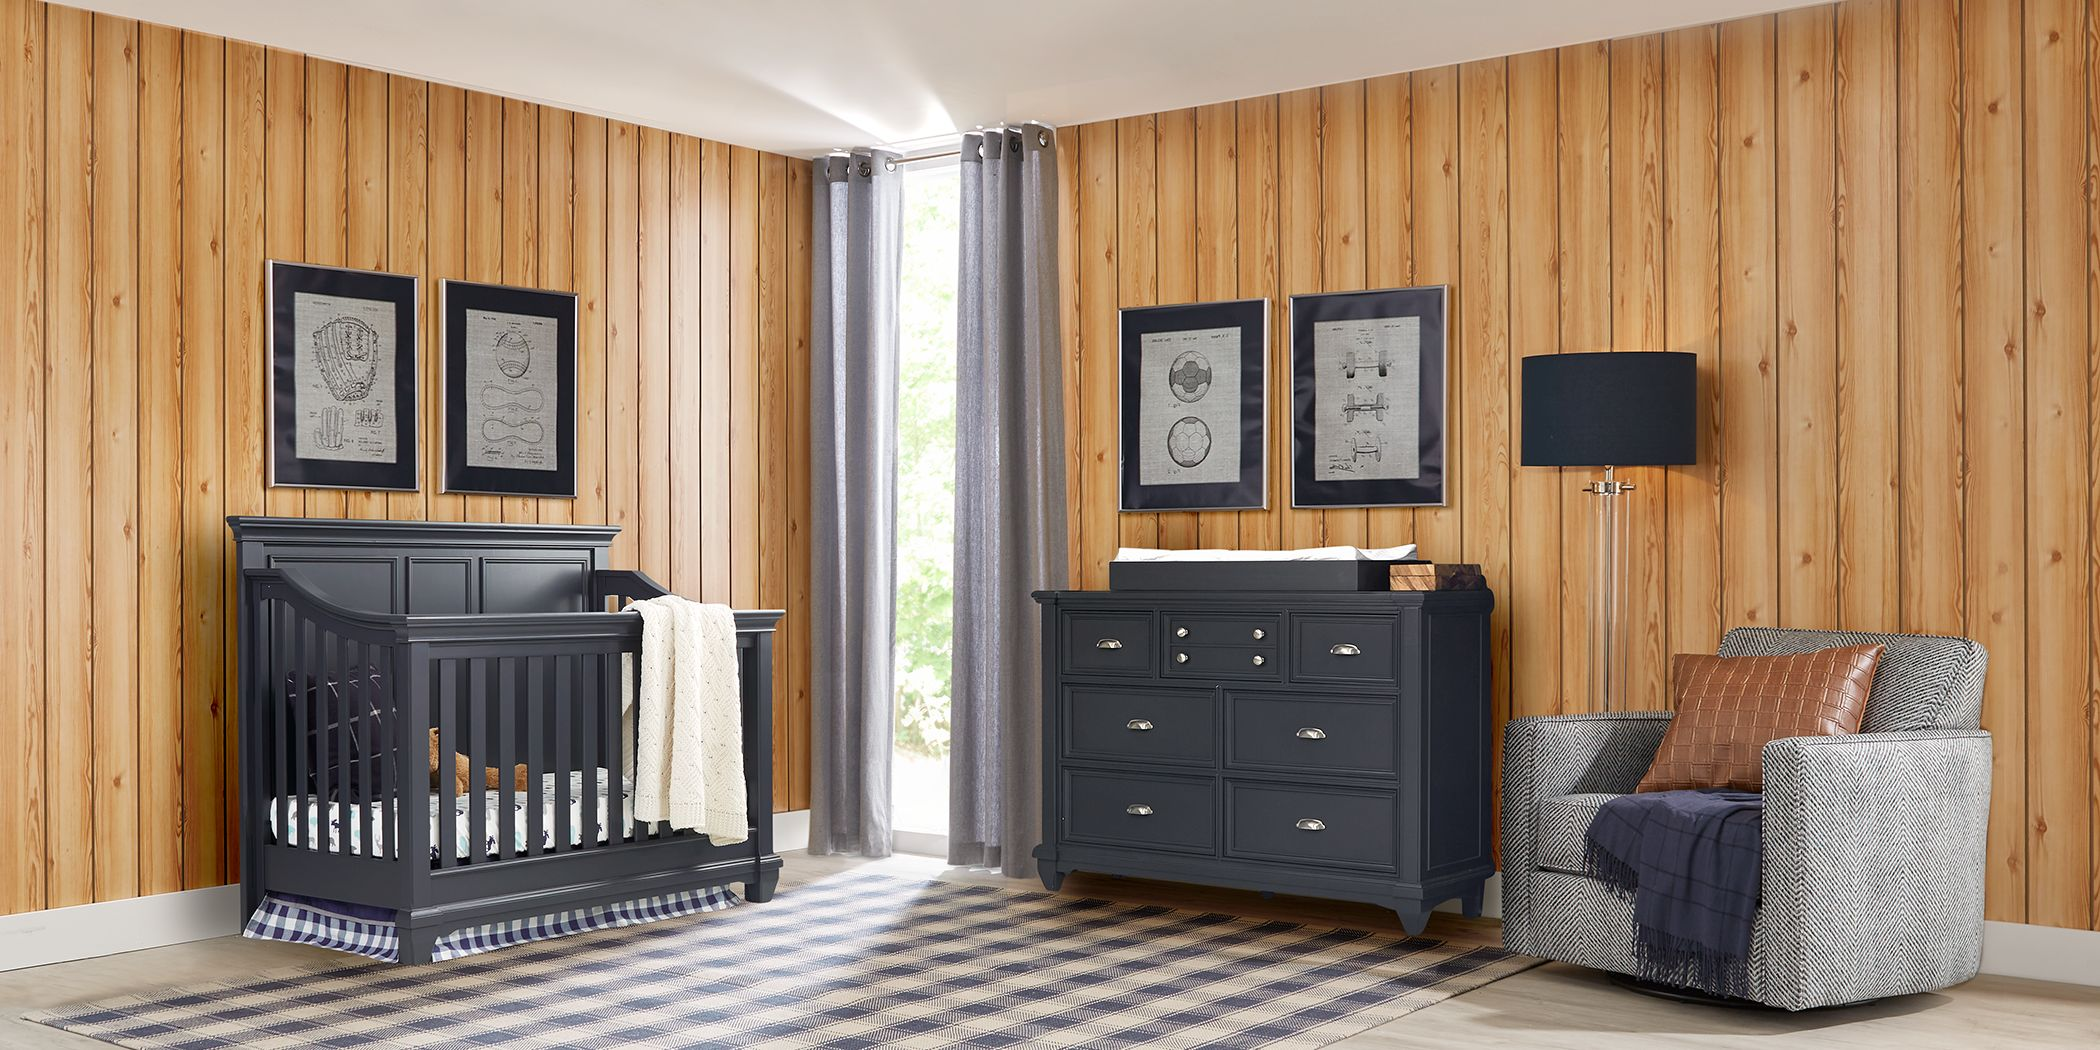 Hilton Head Graphite 5 Pc Nursery with Toddler Rails